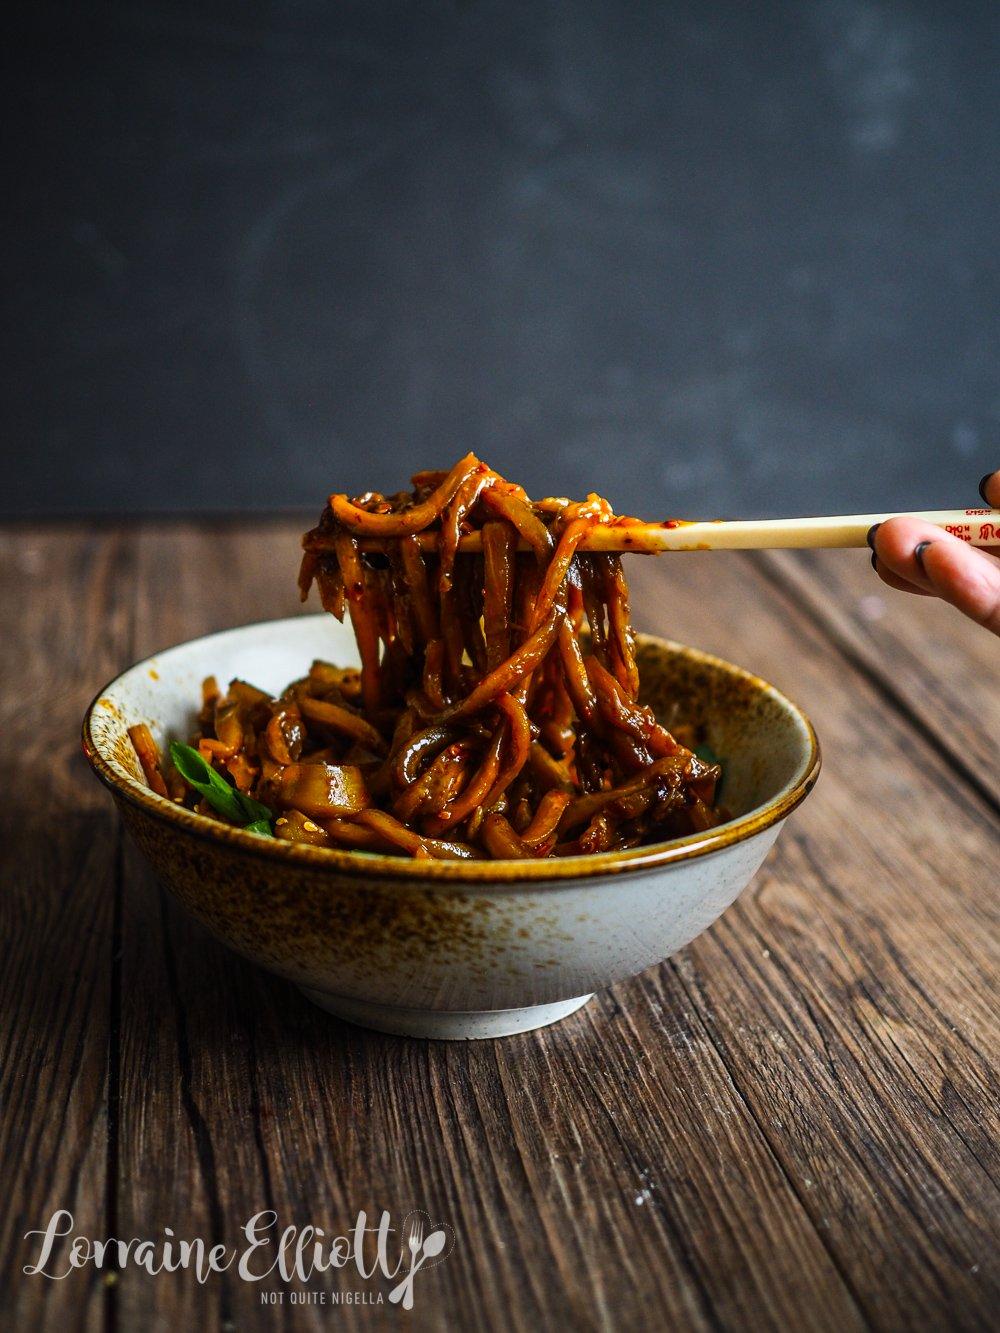 Spicy Eggplant Aubergine Noodles Pasta